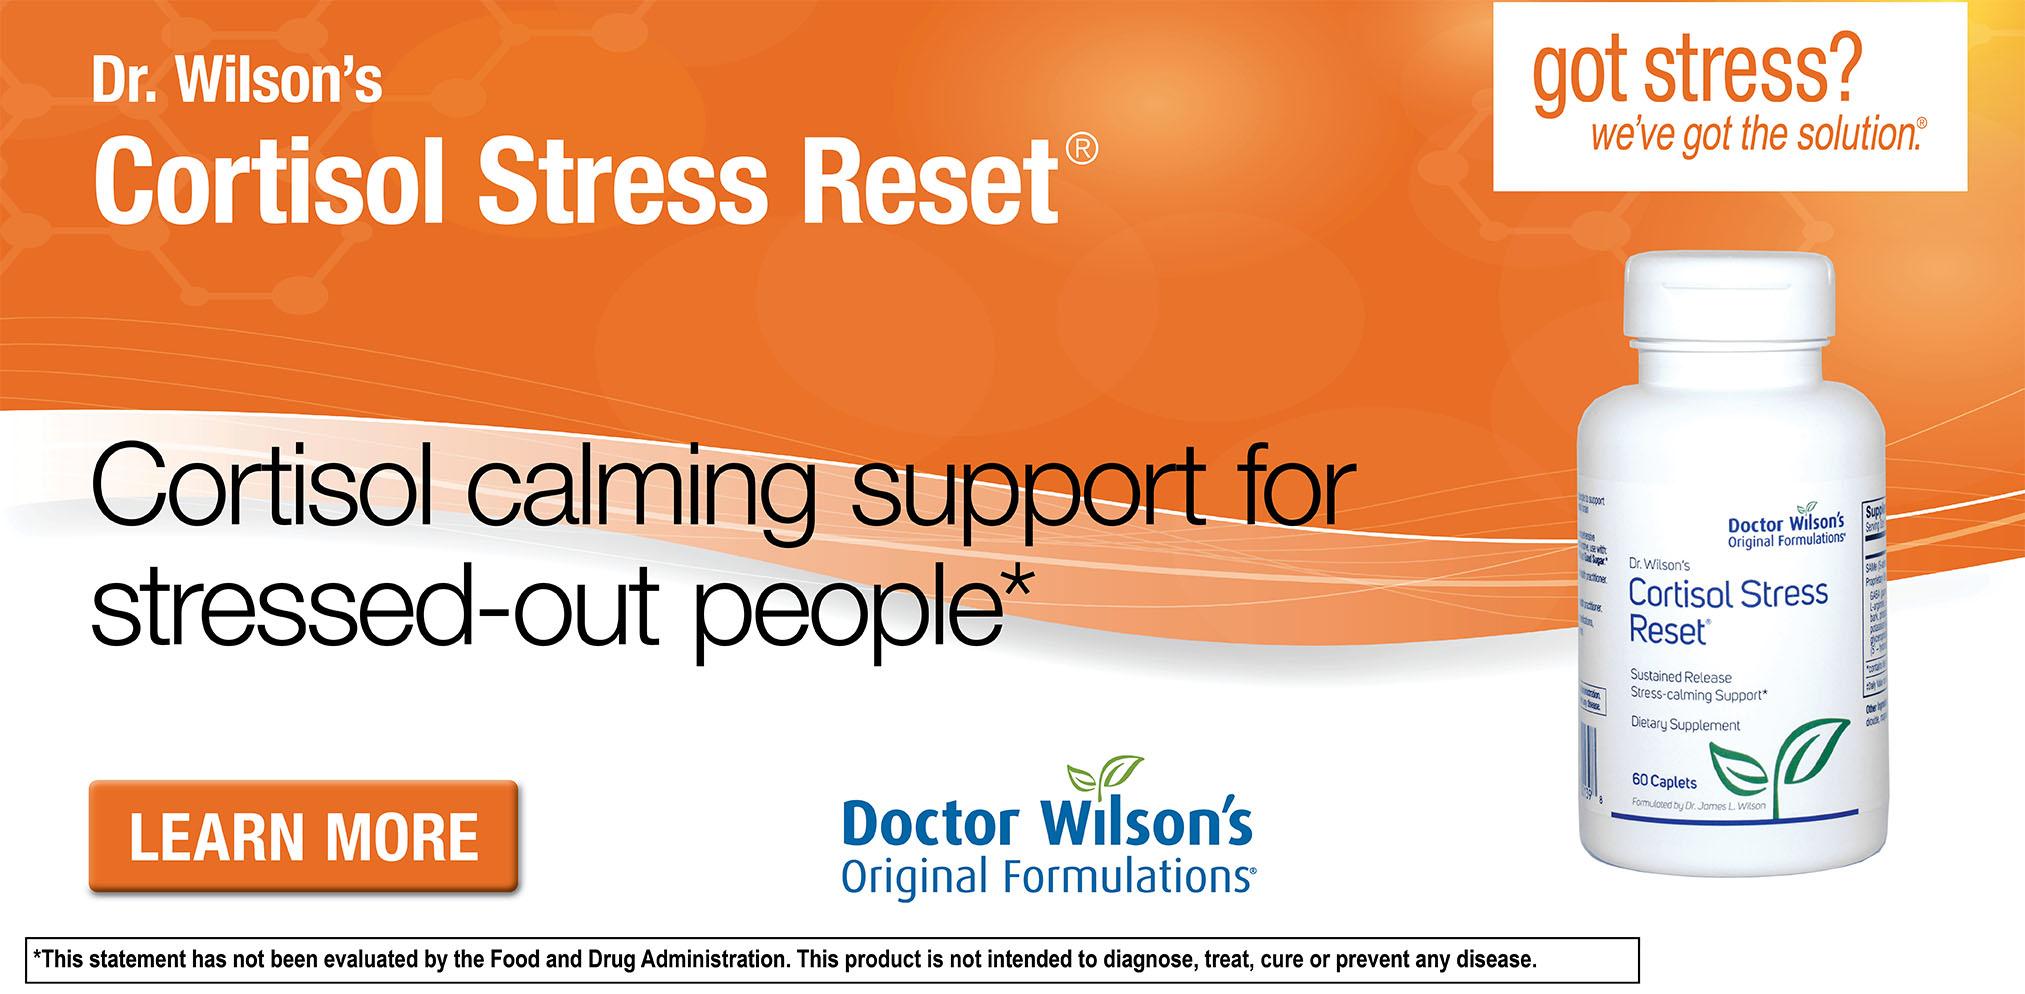 Dr. Wilson's Cortisol Stress Reset